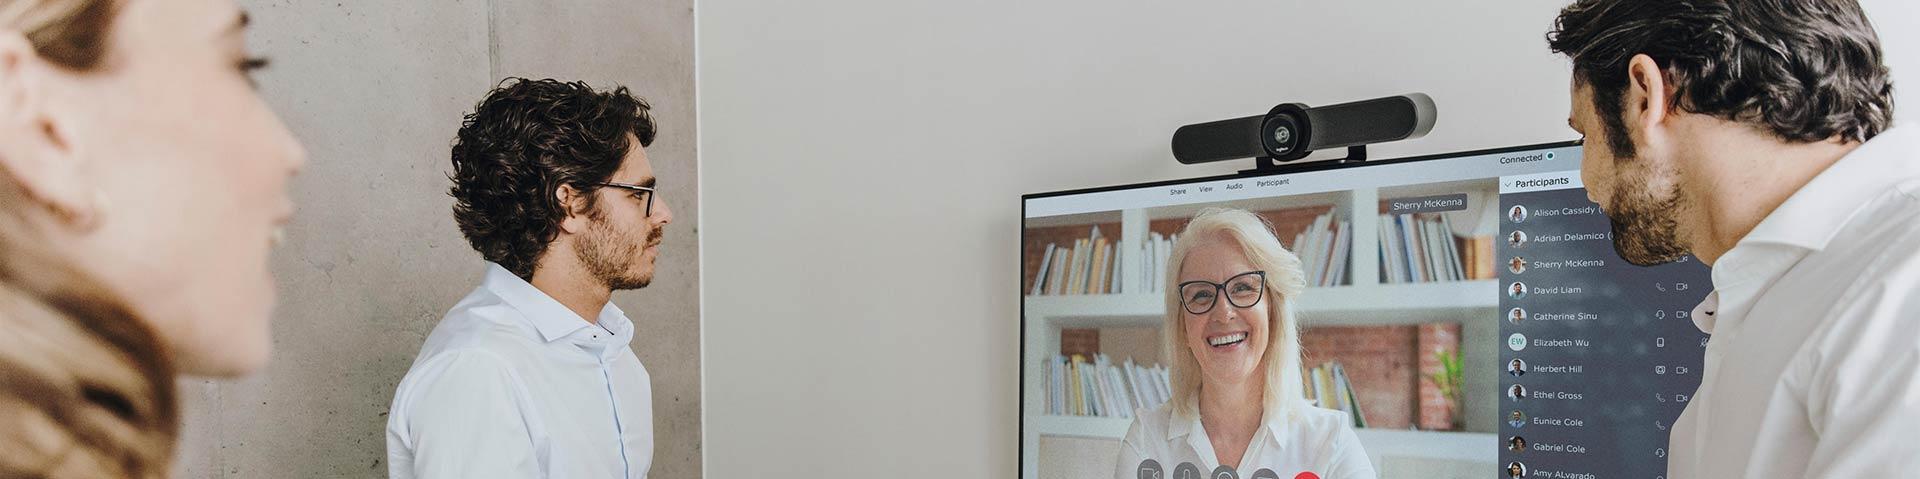 solid-concept-medientechnik-videokonferenzen-1